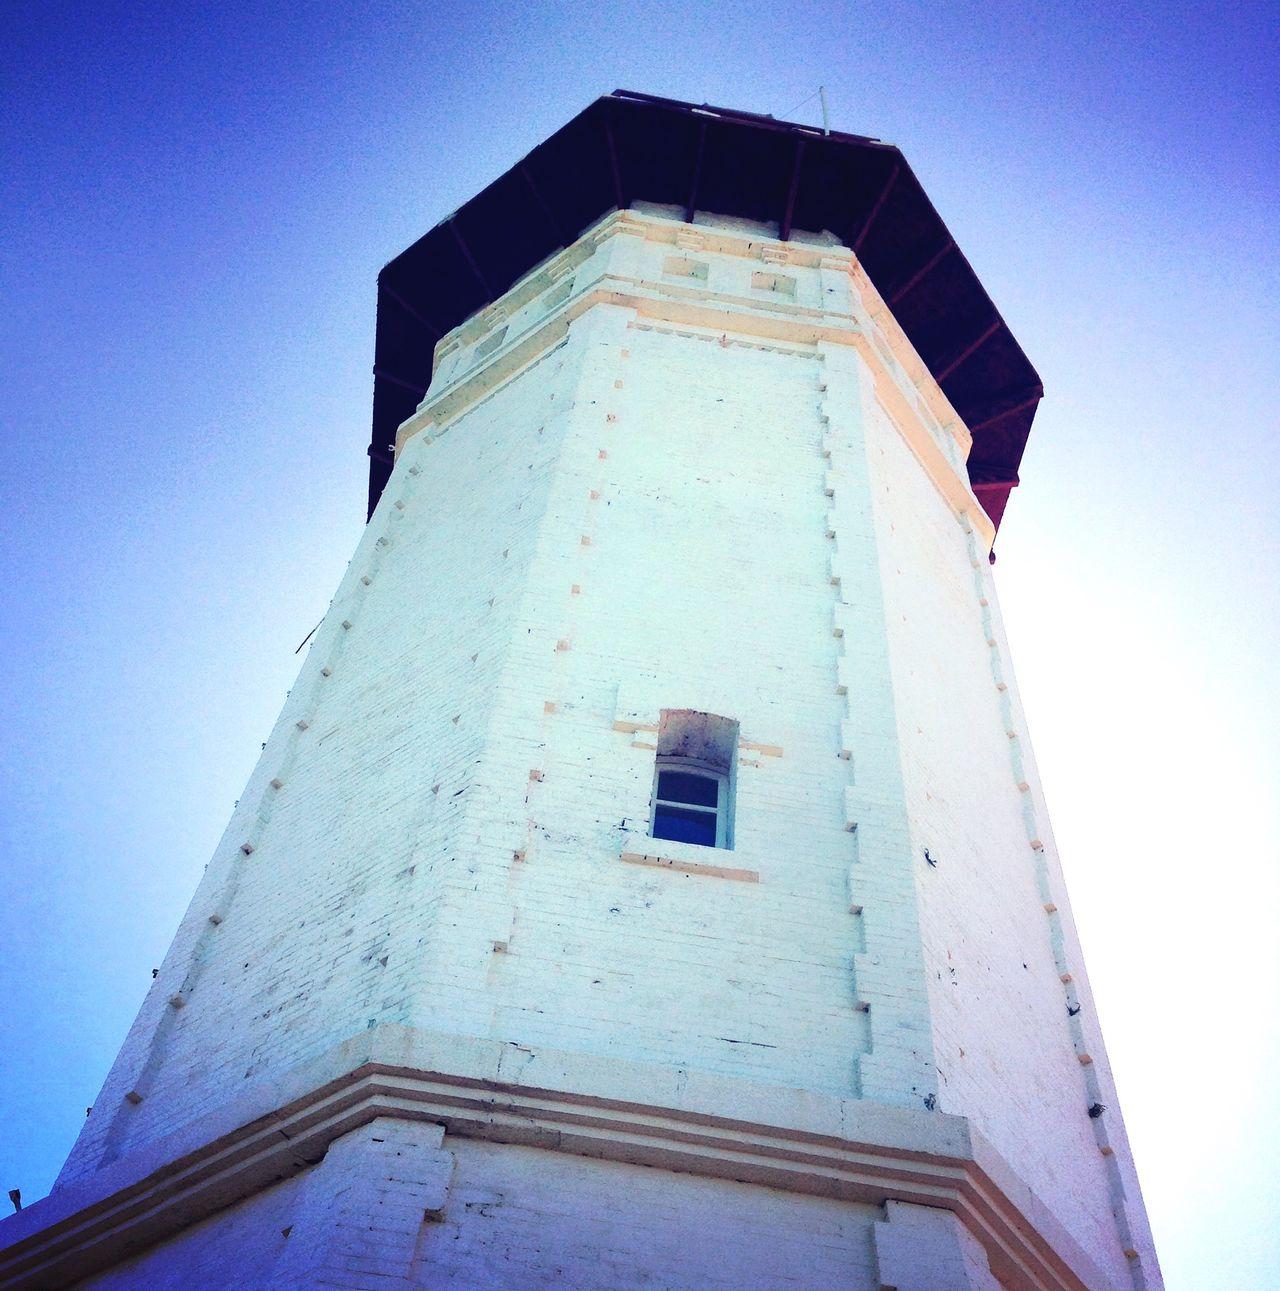 Lighthouse Ilocos Norte, Philippines